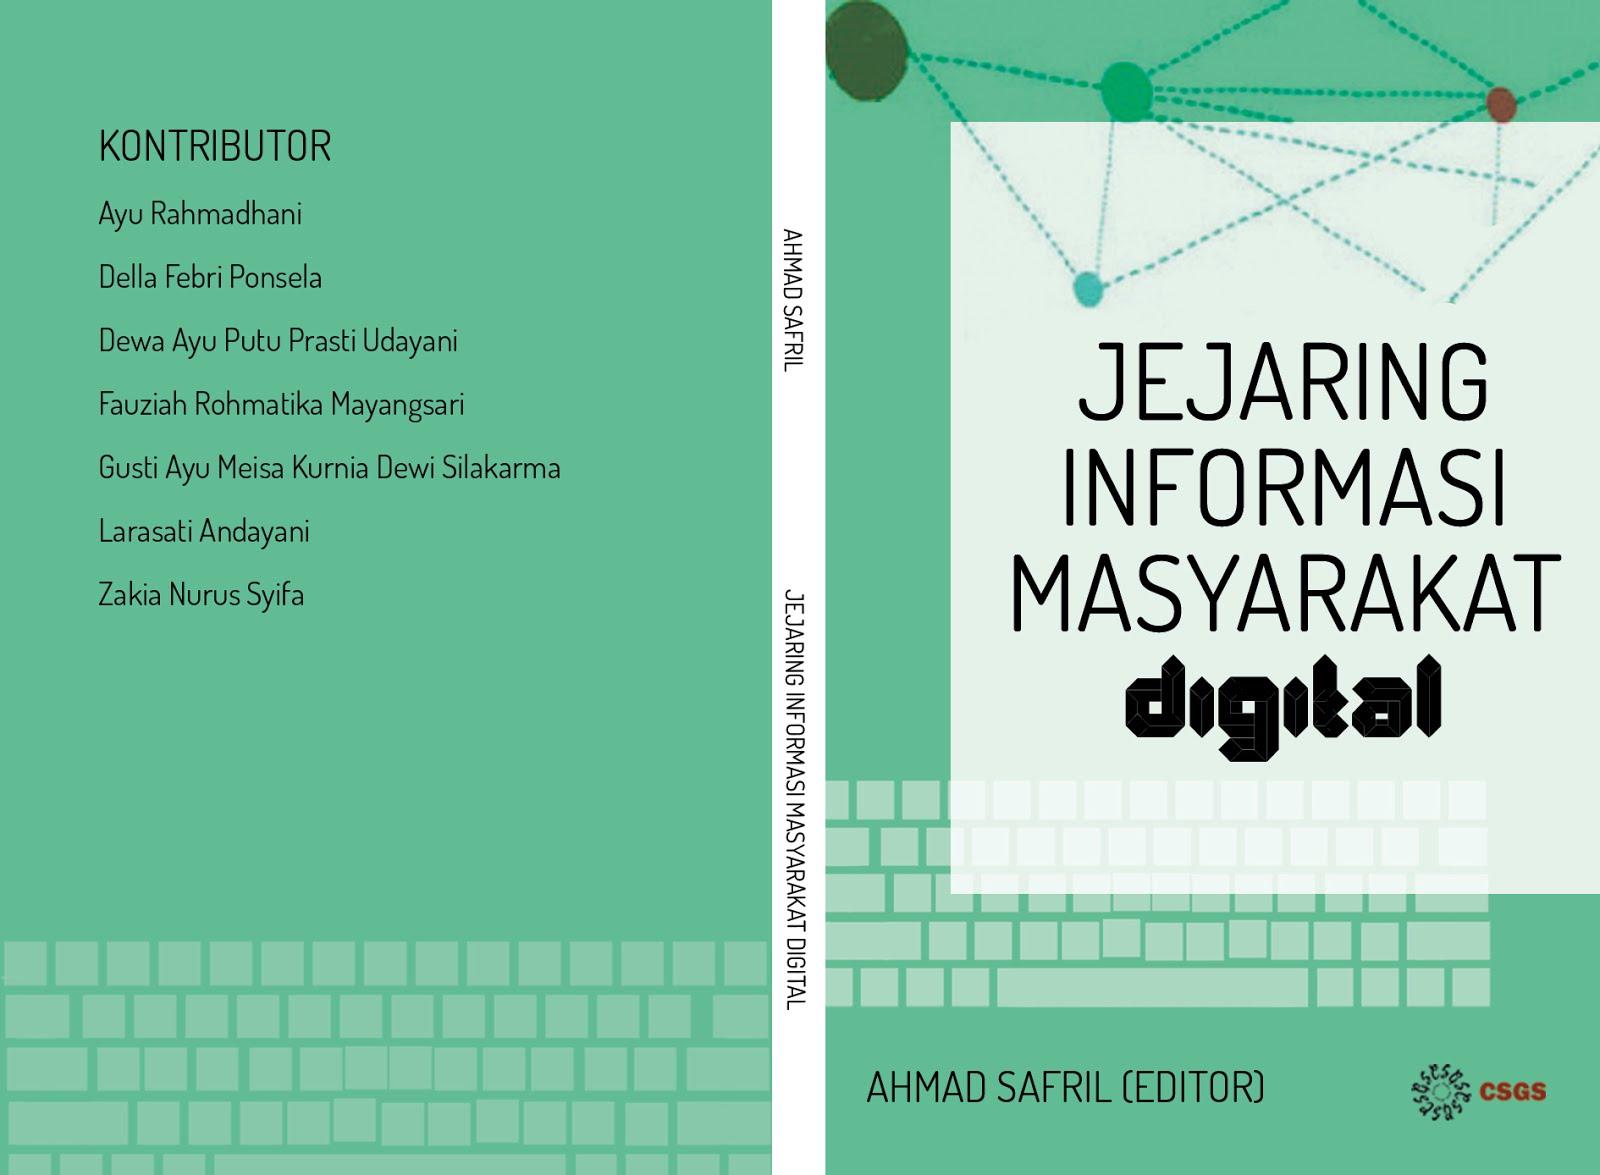 Jejaring Informasi Masyarakat Digital